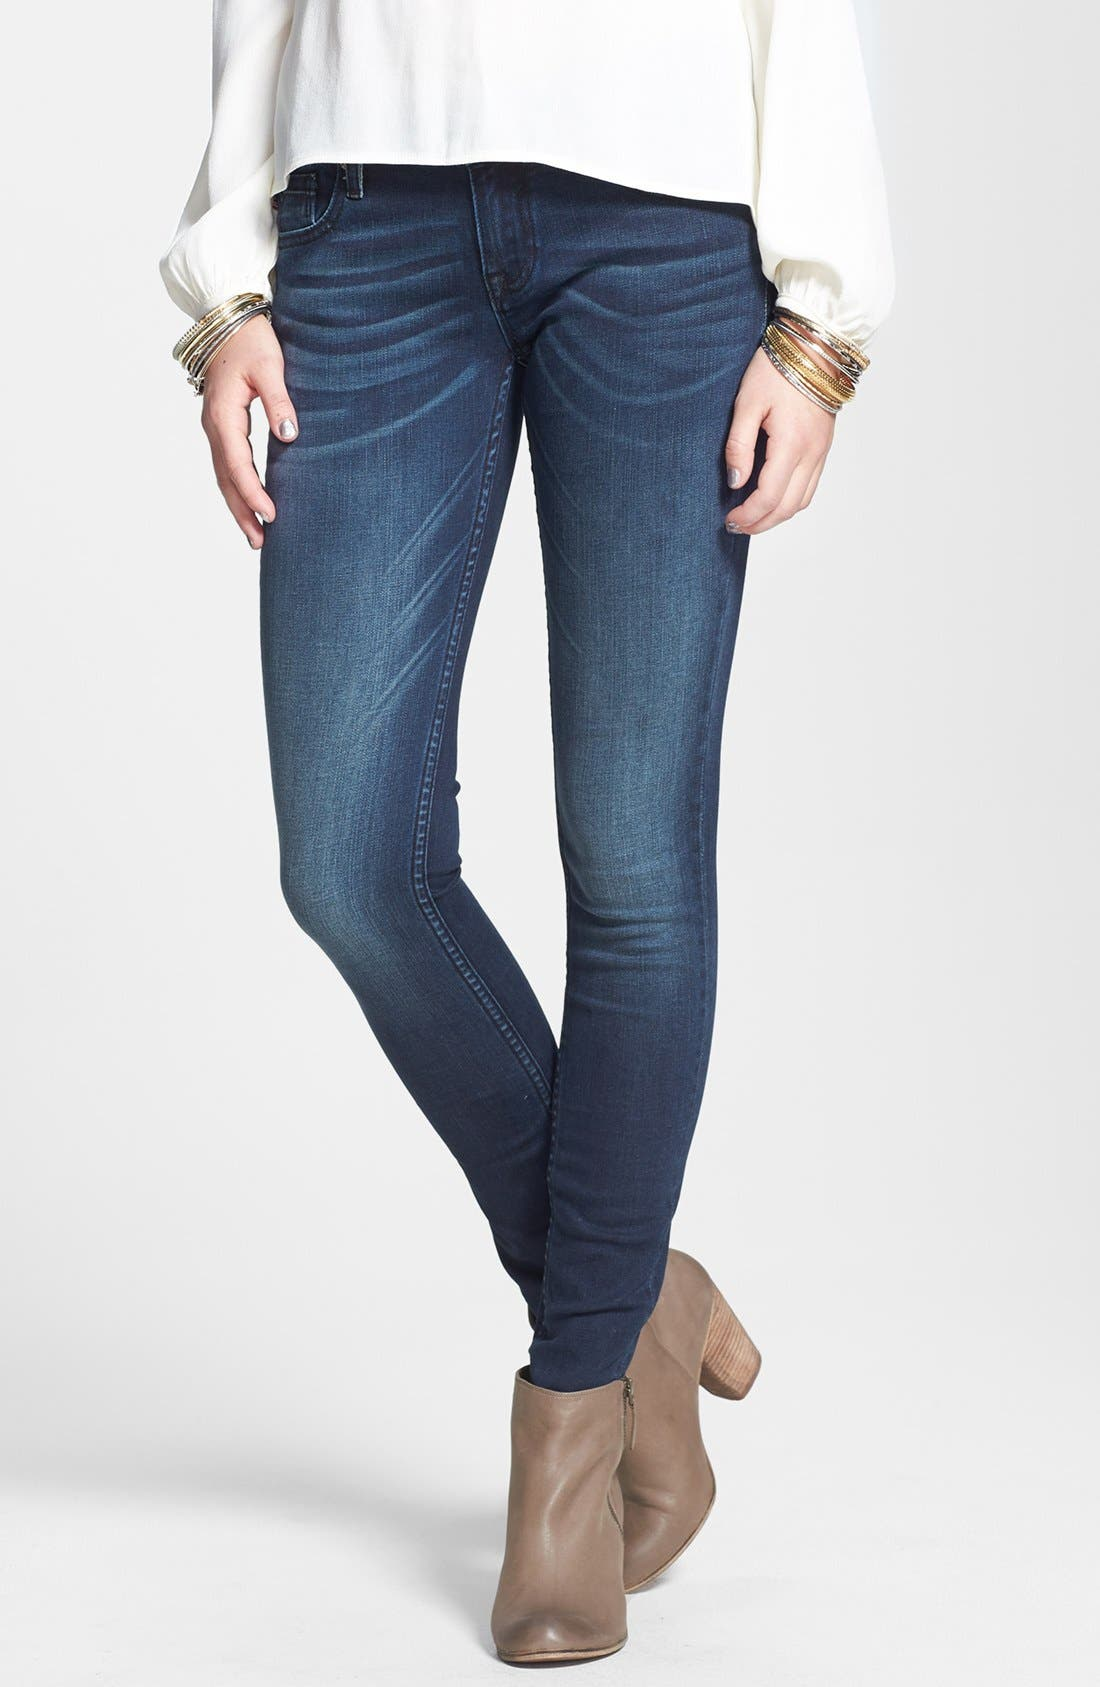 Main Image - Vigoss 'New York' Flap Pocket Skinny Jeans (Ink)